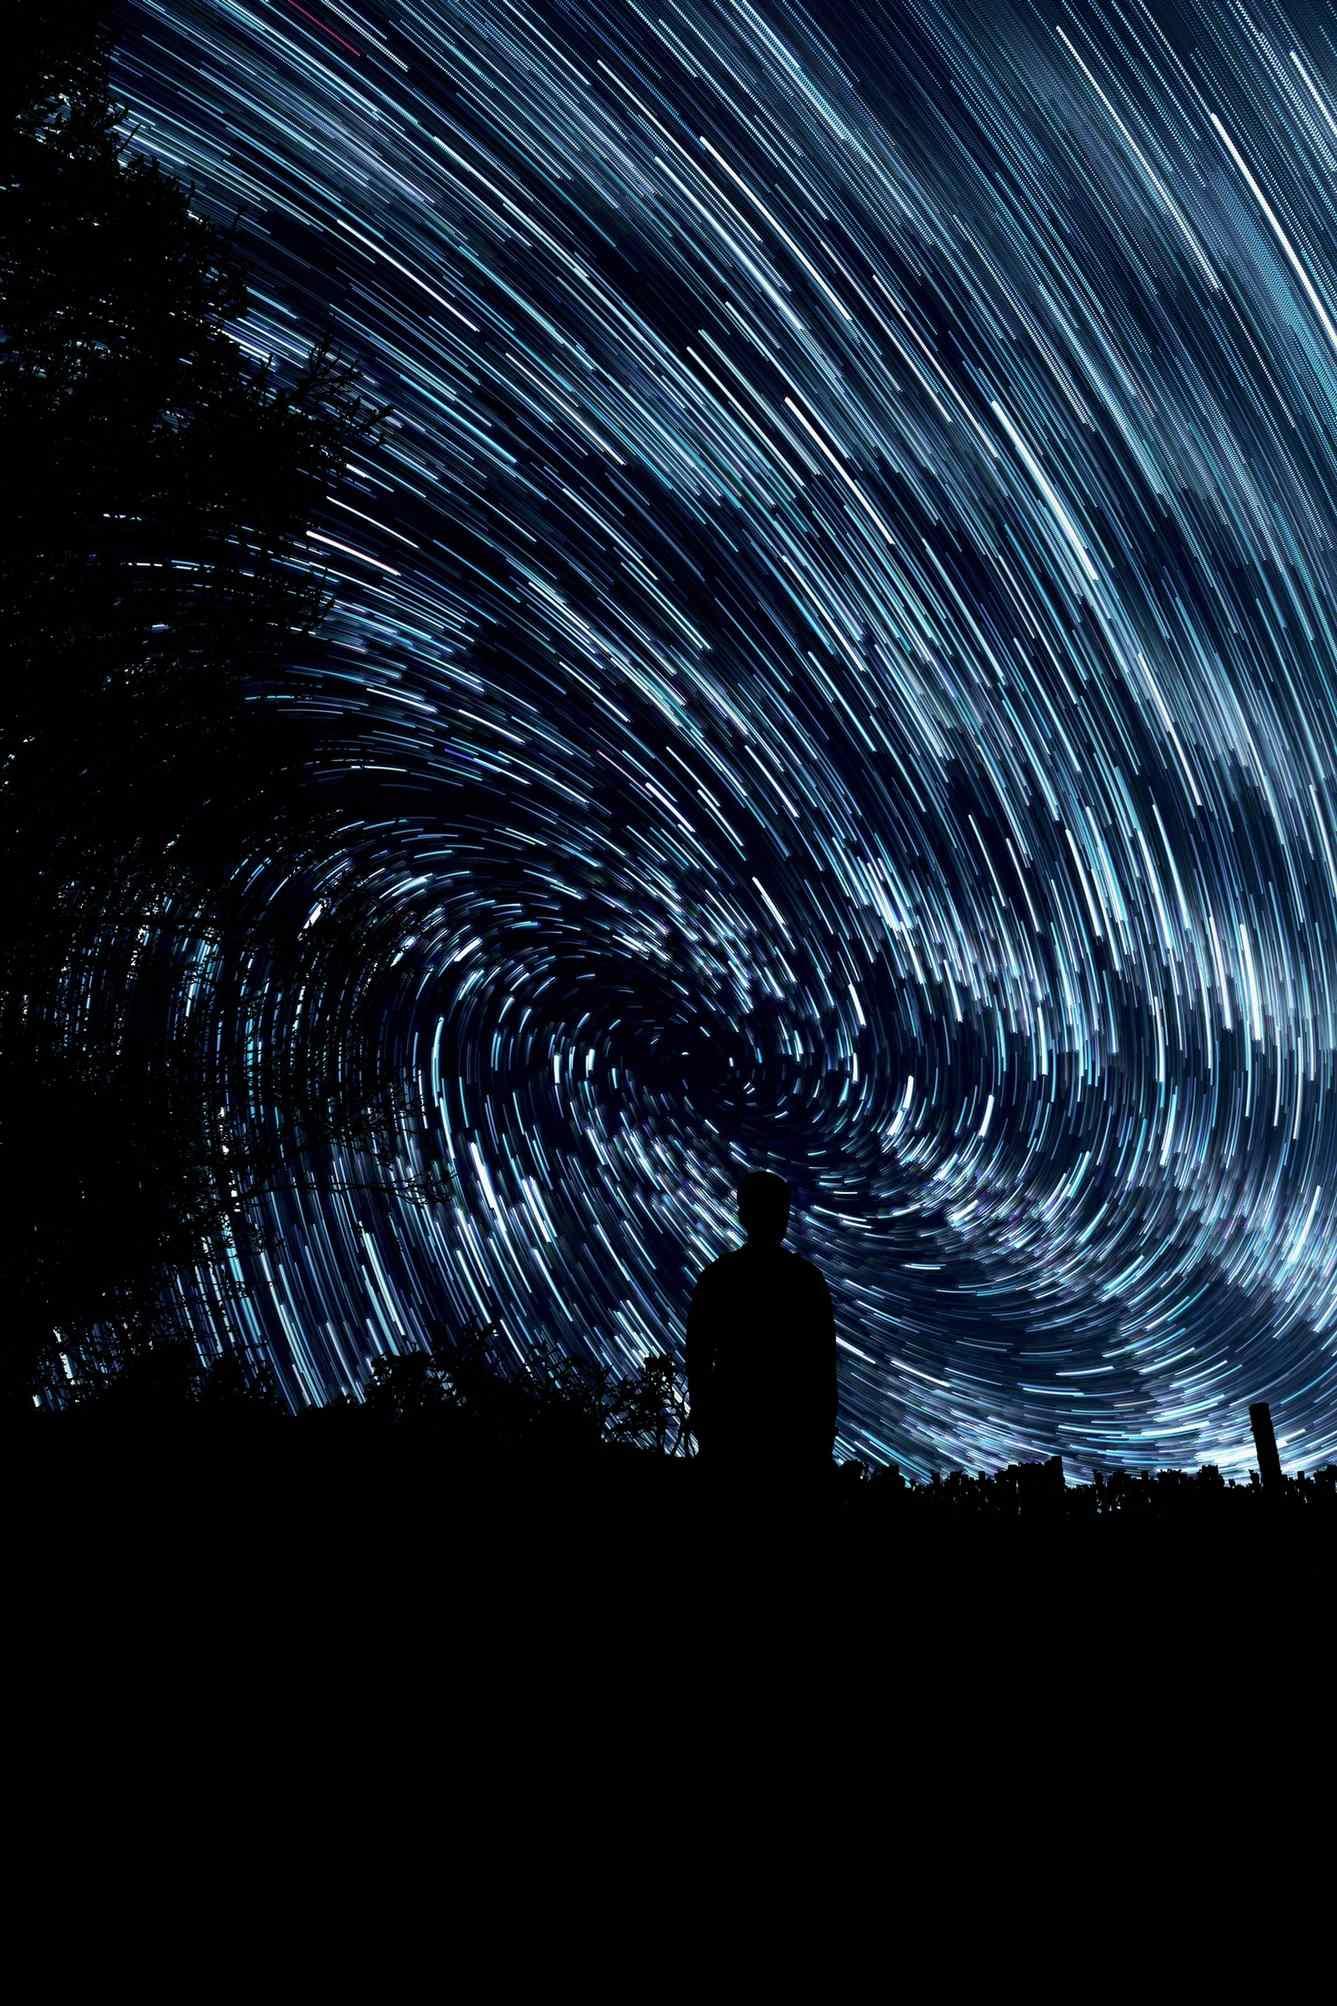 Blick auf den Sterrnenhimmel